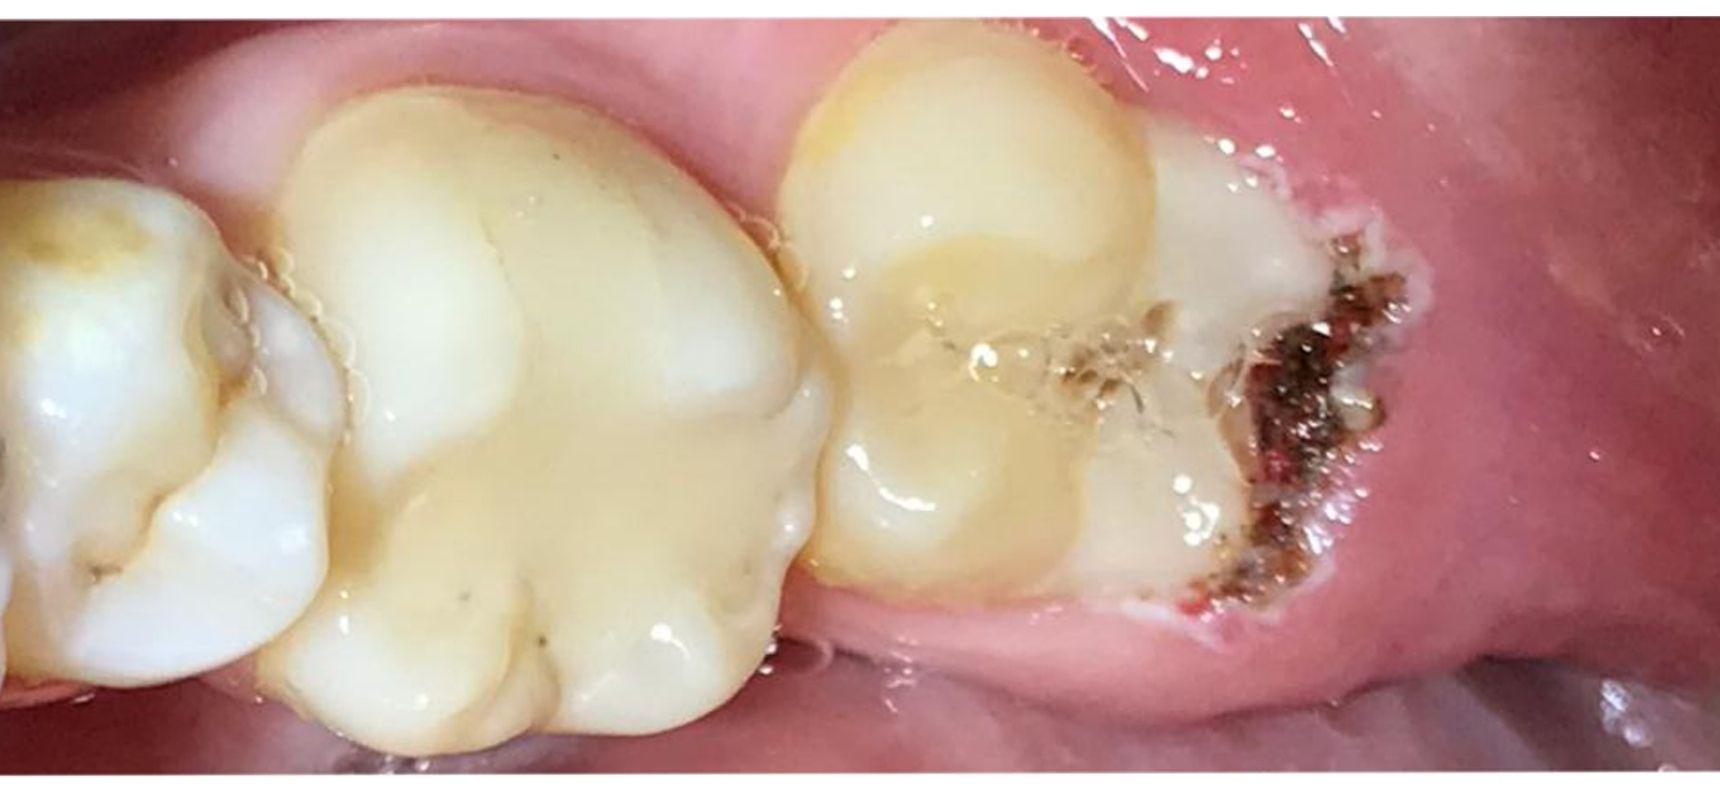 Before- Pulmology